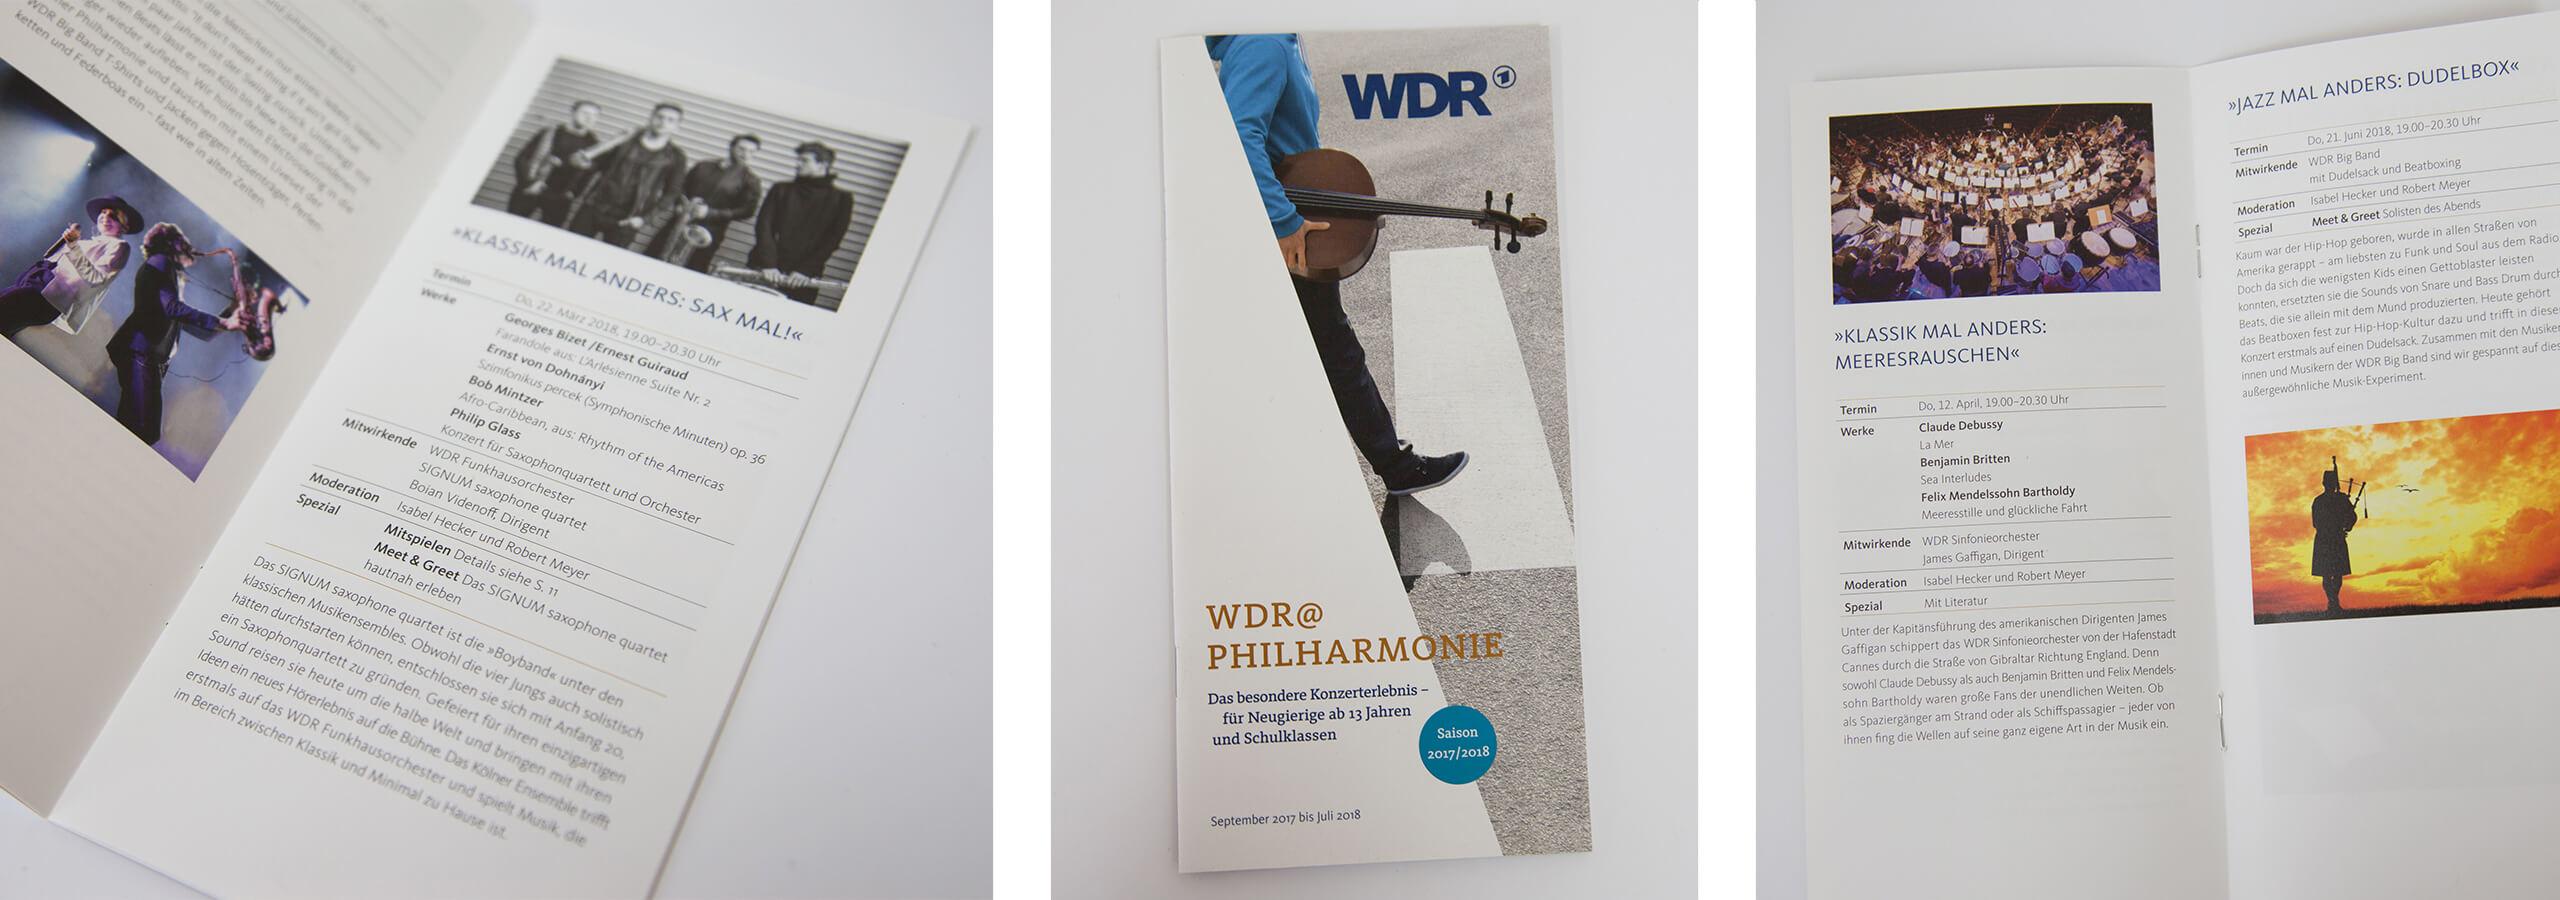 WDR Philharmonie